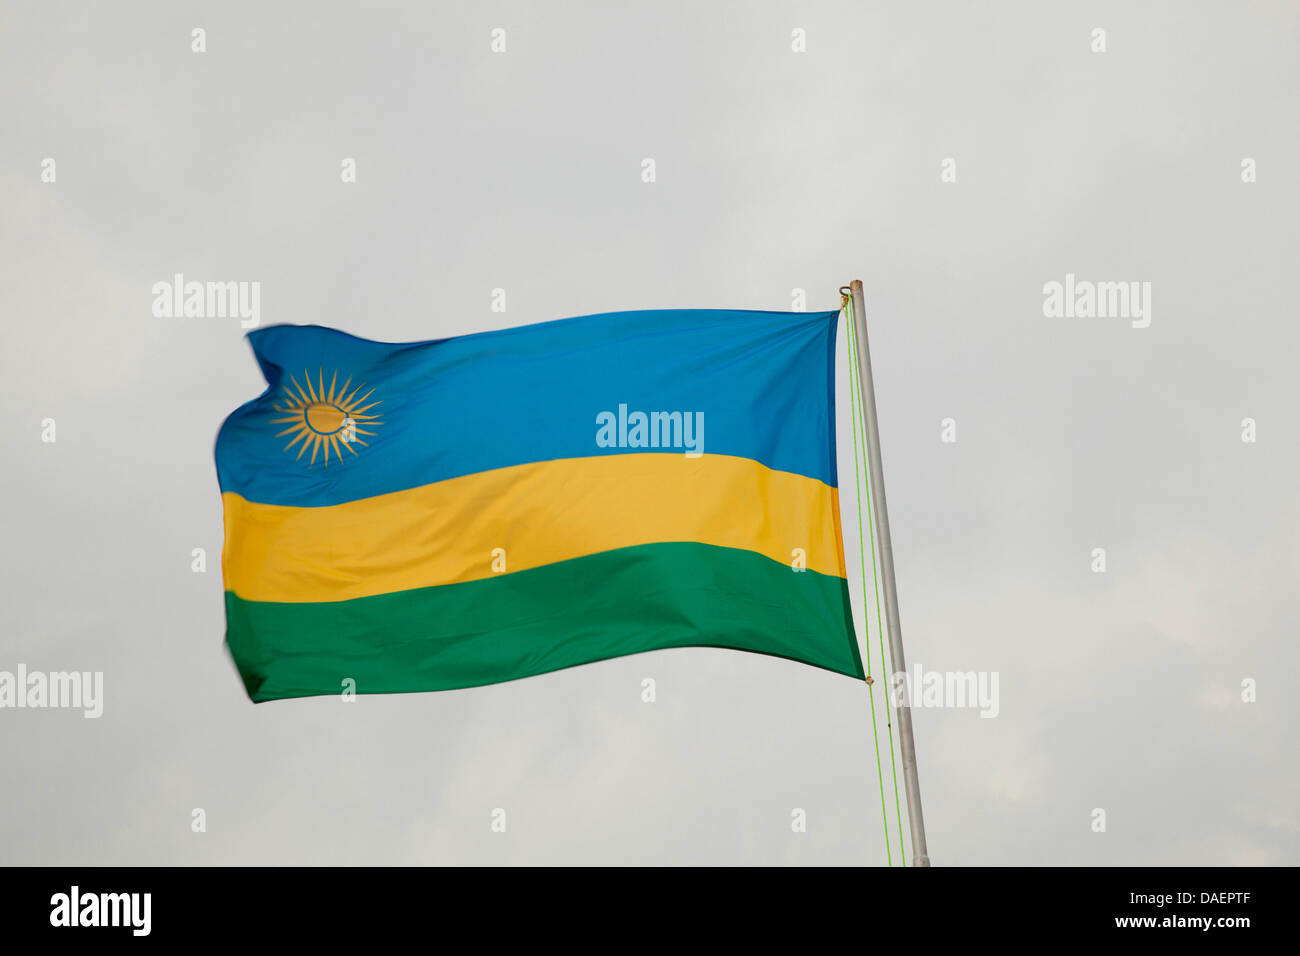 flag of Ruanda blowing in the wind, Rwanda - Stock Image